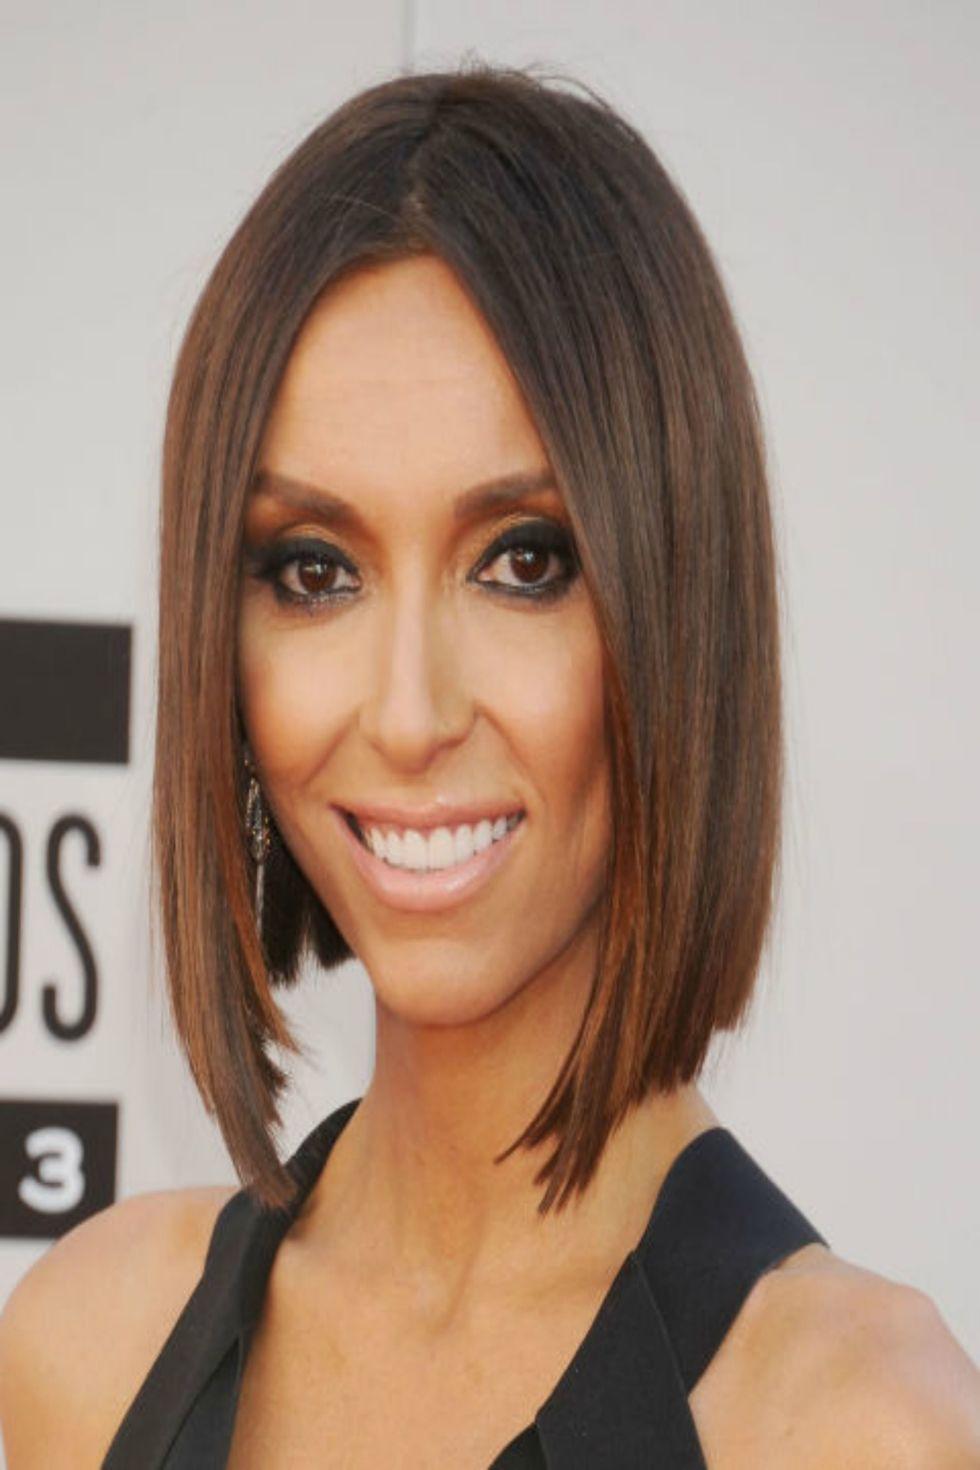 Fantastic 46 Great Medium Hairstyles Haircuts For Mid Length Hair Short Hairstyles For Black Women Fulllsitofus